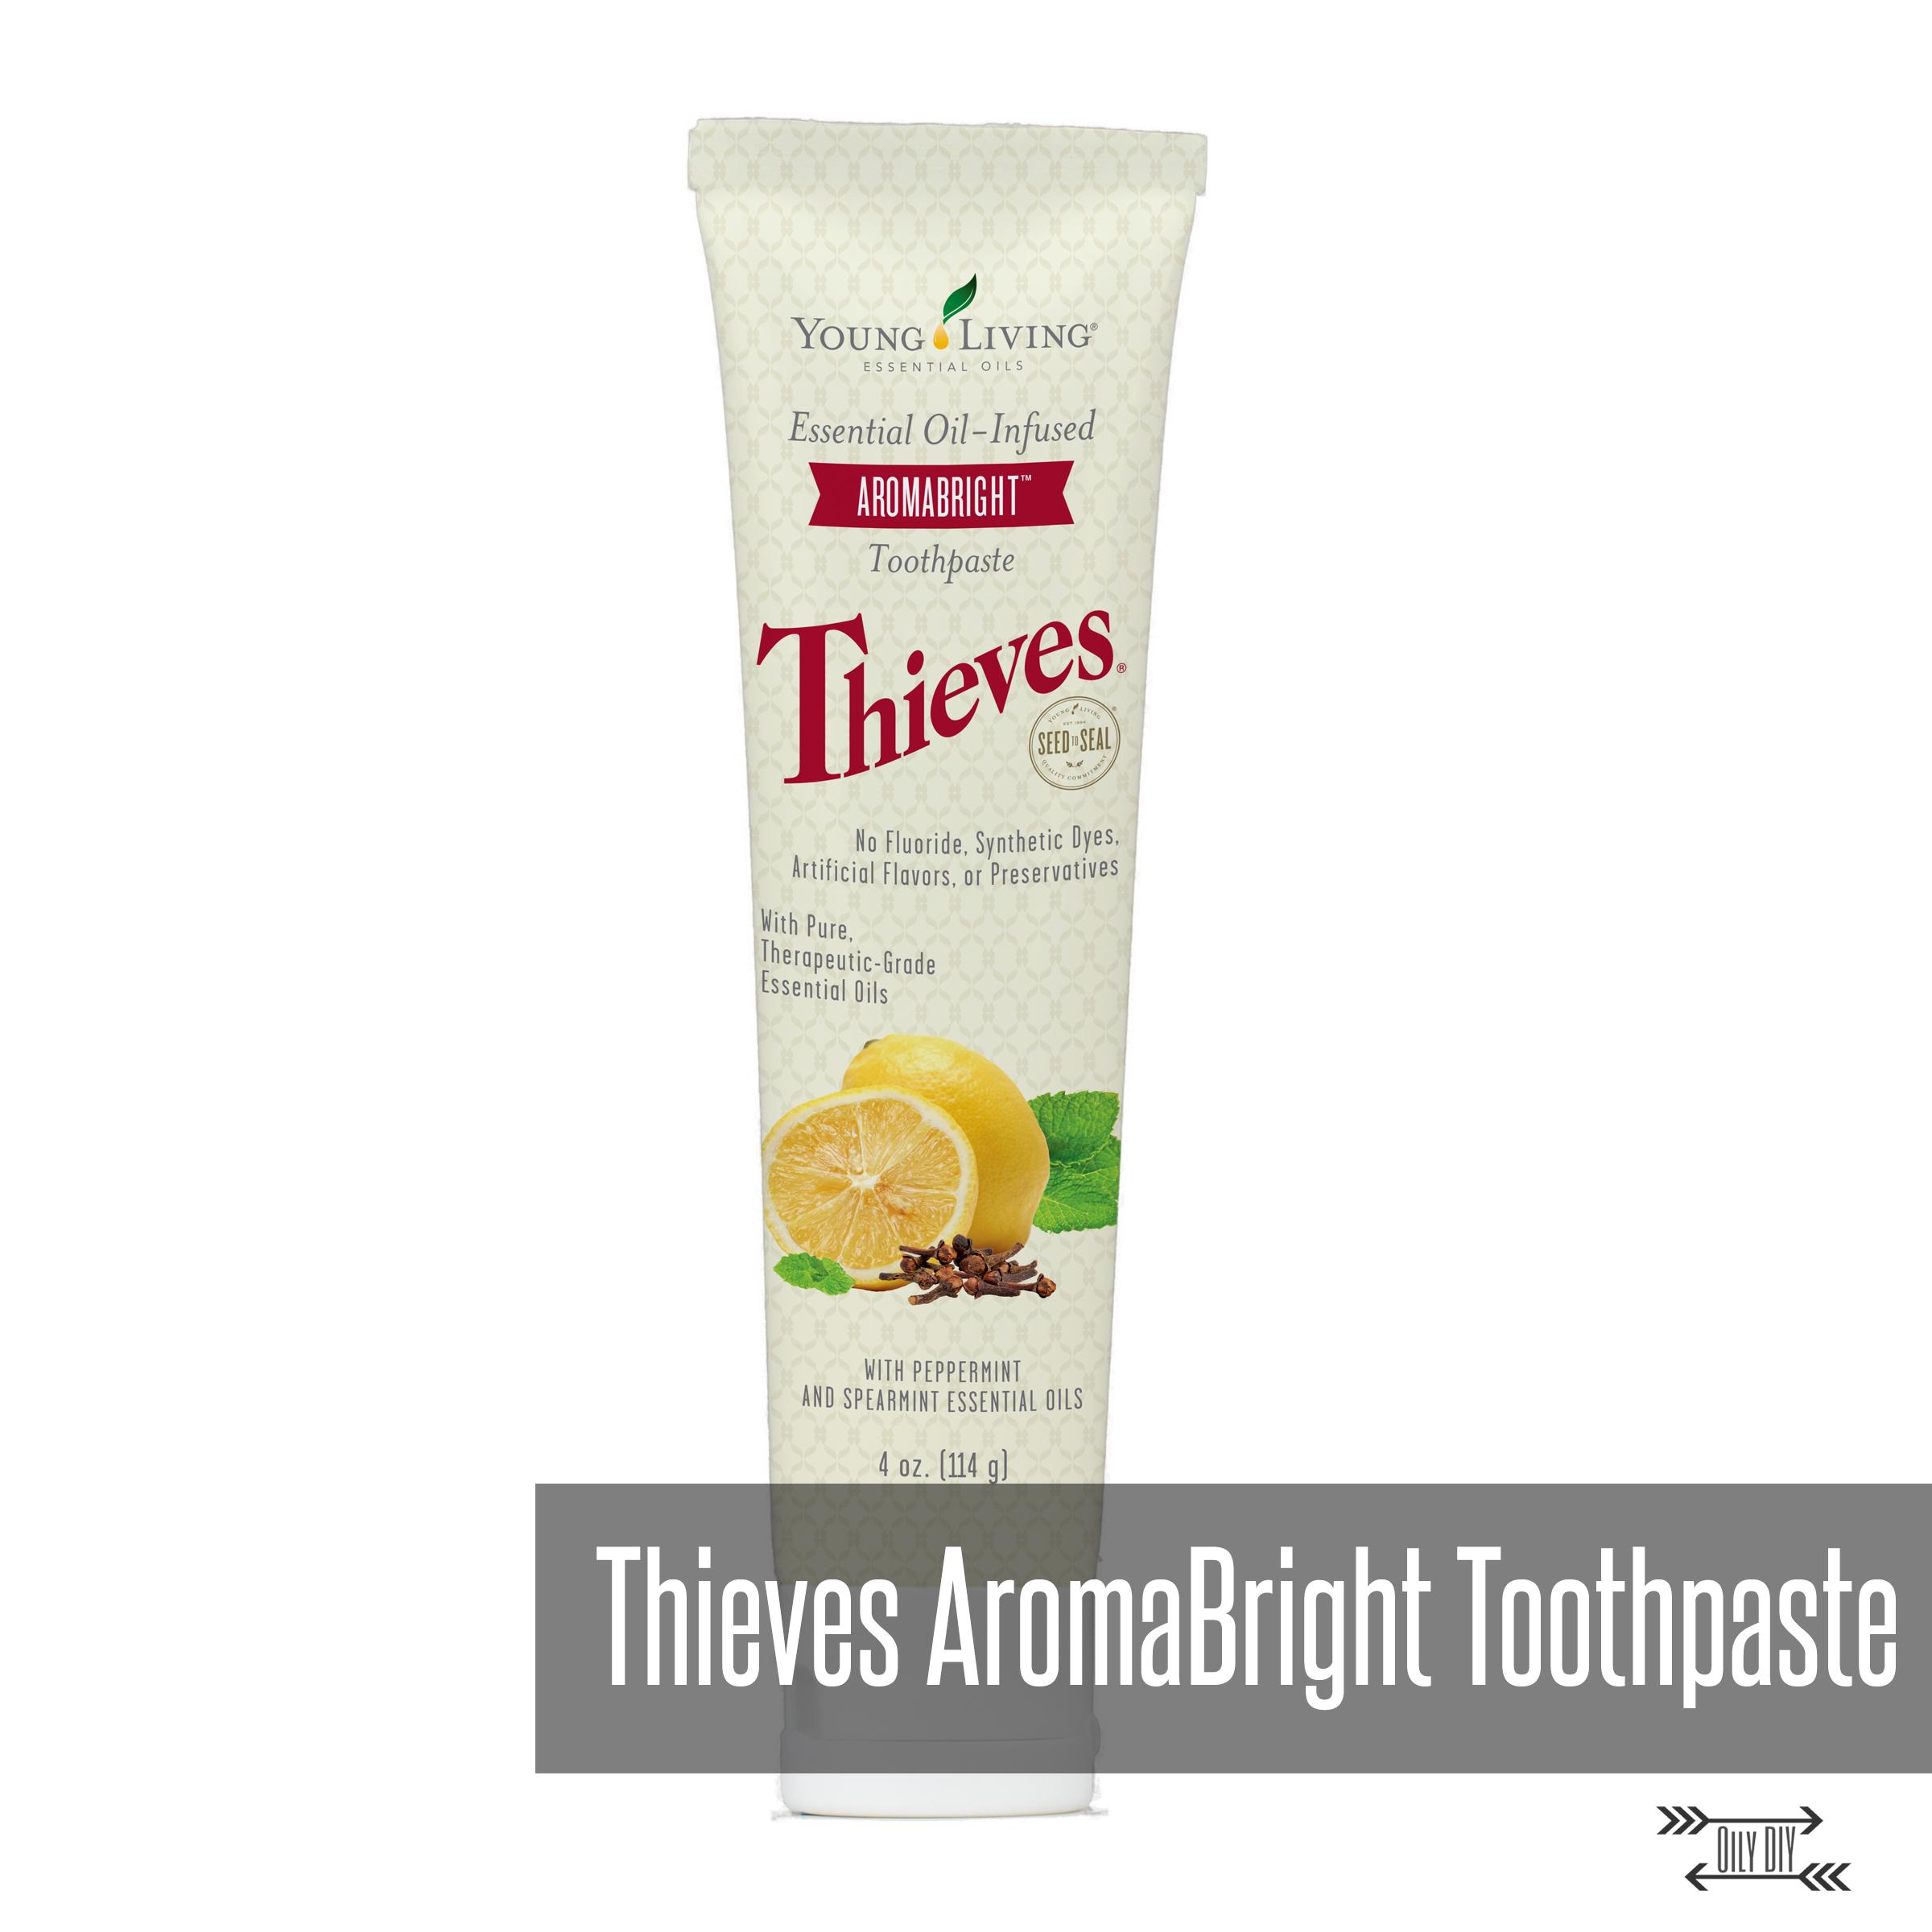 ThievesToothpasteTitle.jpg